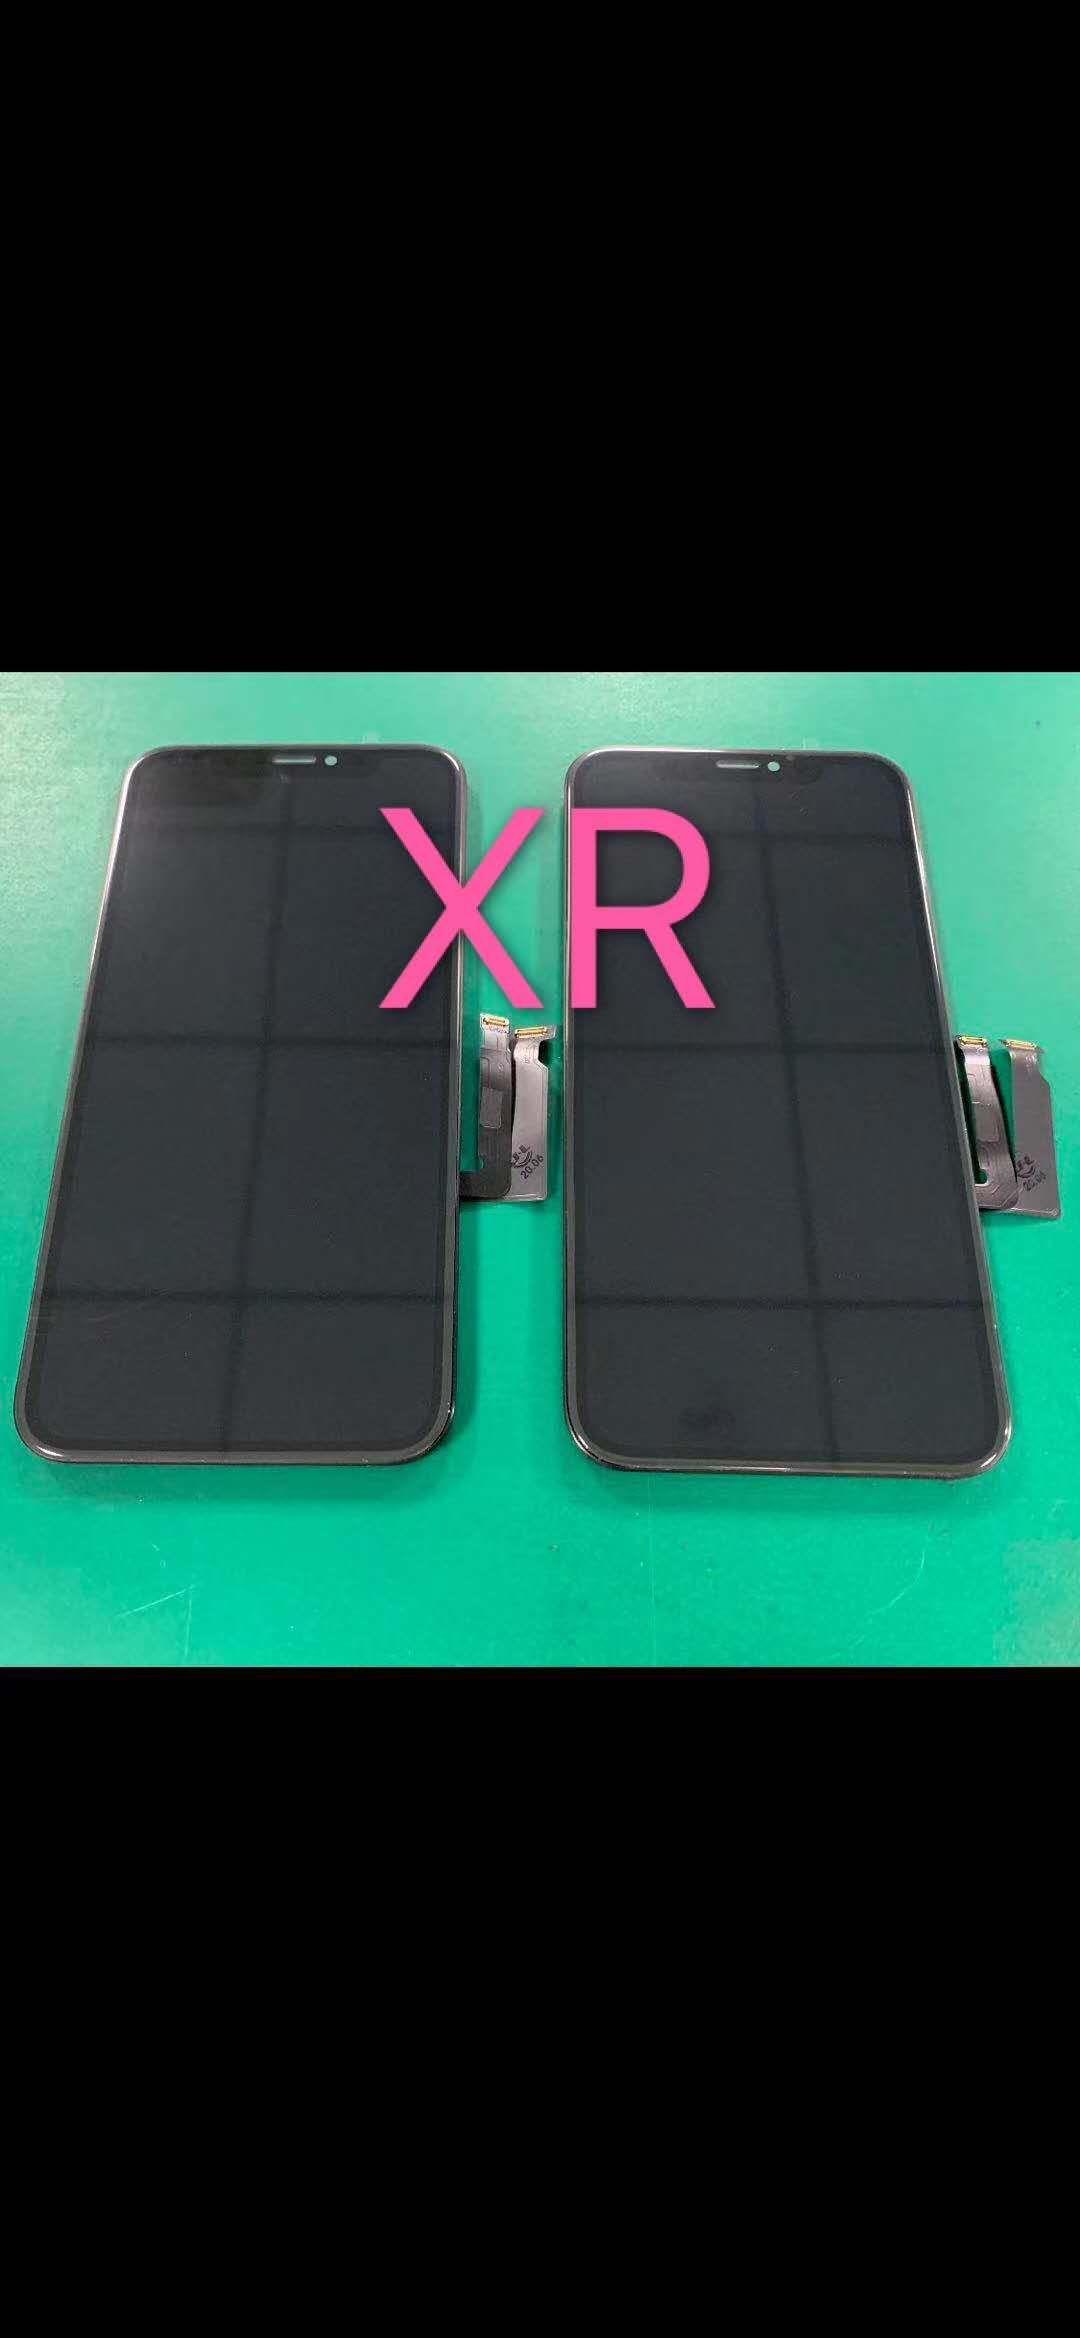 gran valor del envío libre de la asamblea LCD digitalizador de pantalla LCD OEM para XR XR iPhone con placa y tornillos